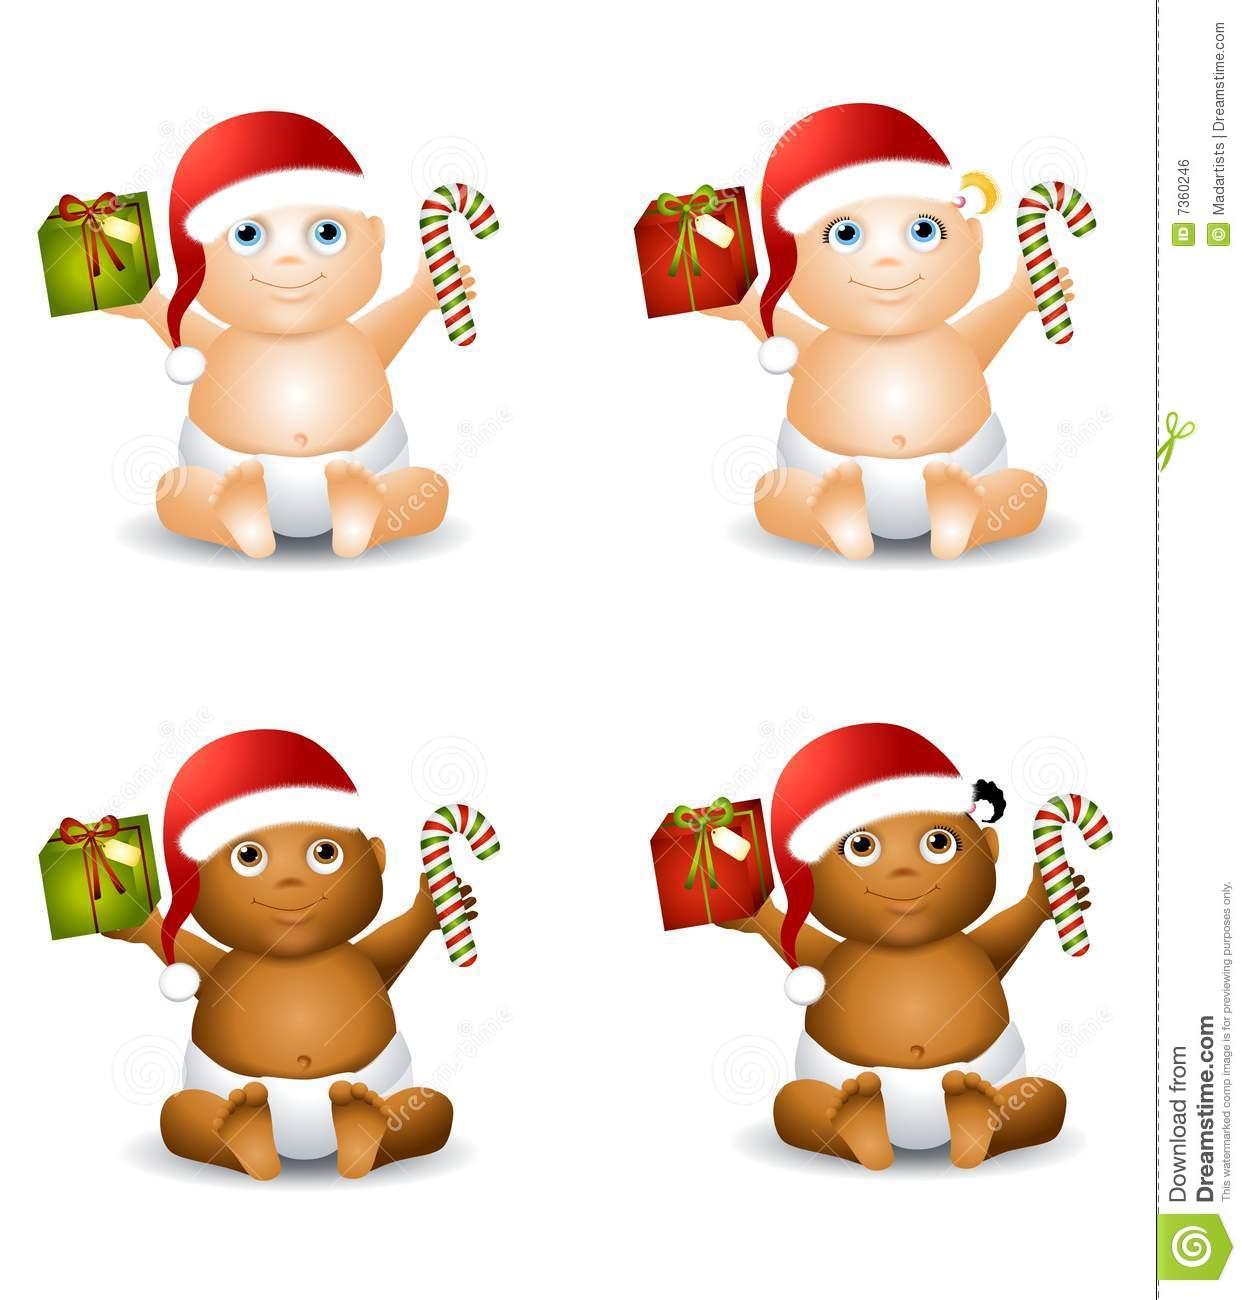 Christmas Baby Clip Art stock illustration. Illustration of gifts.